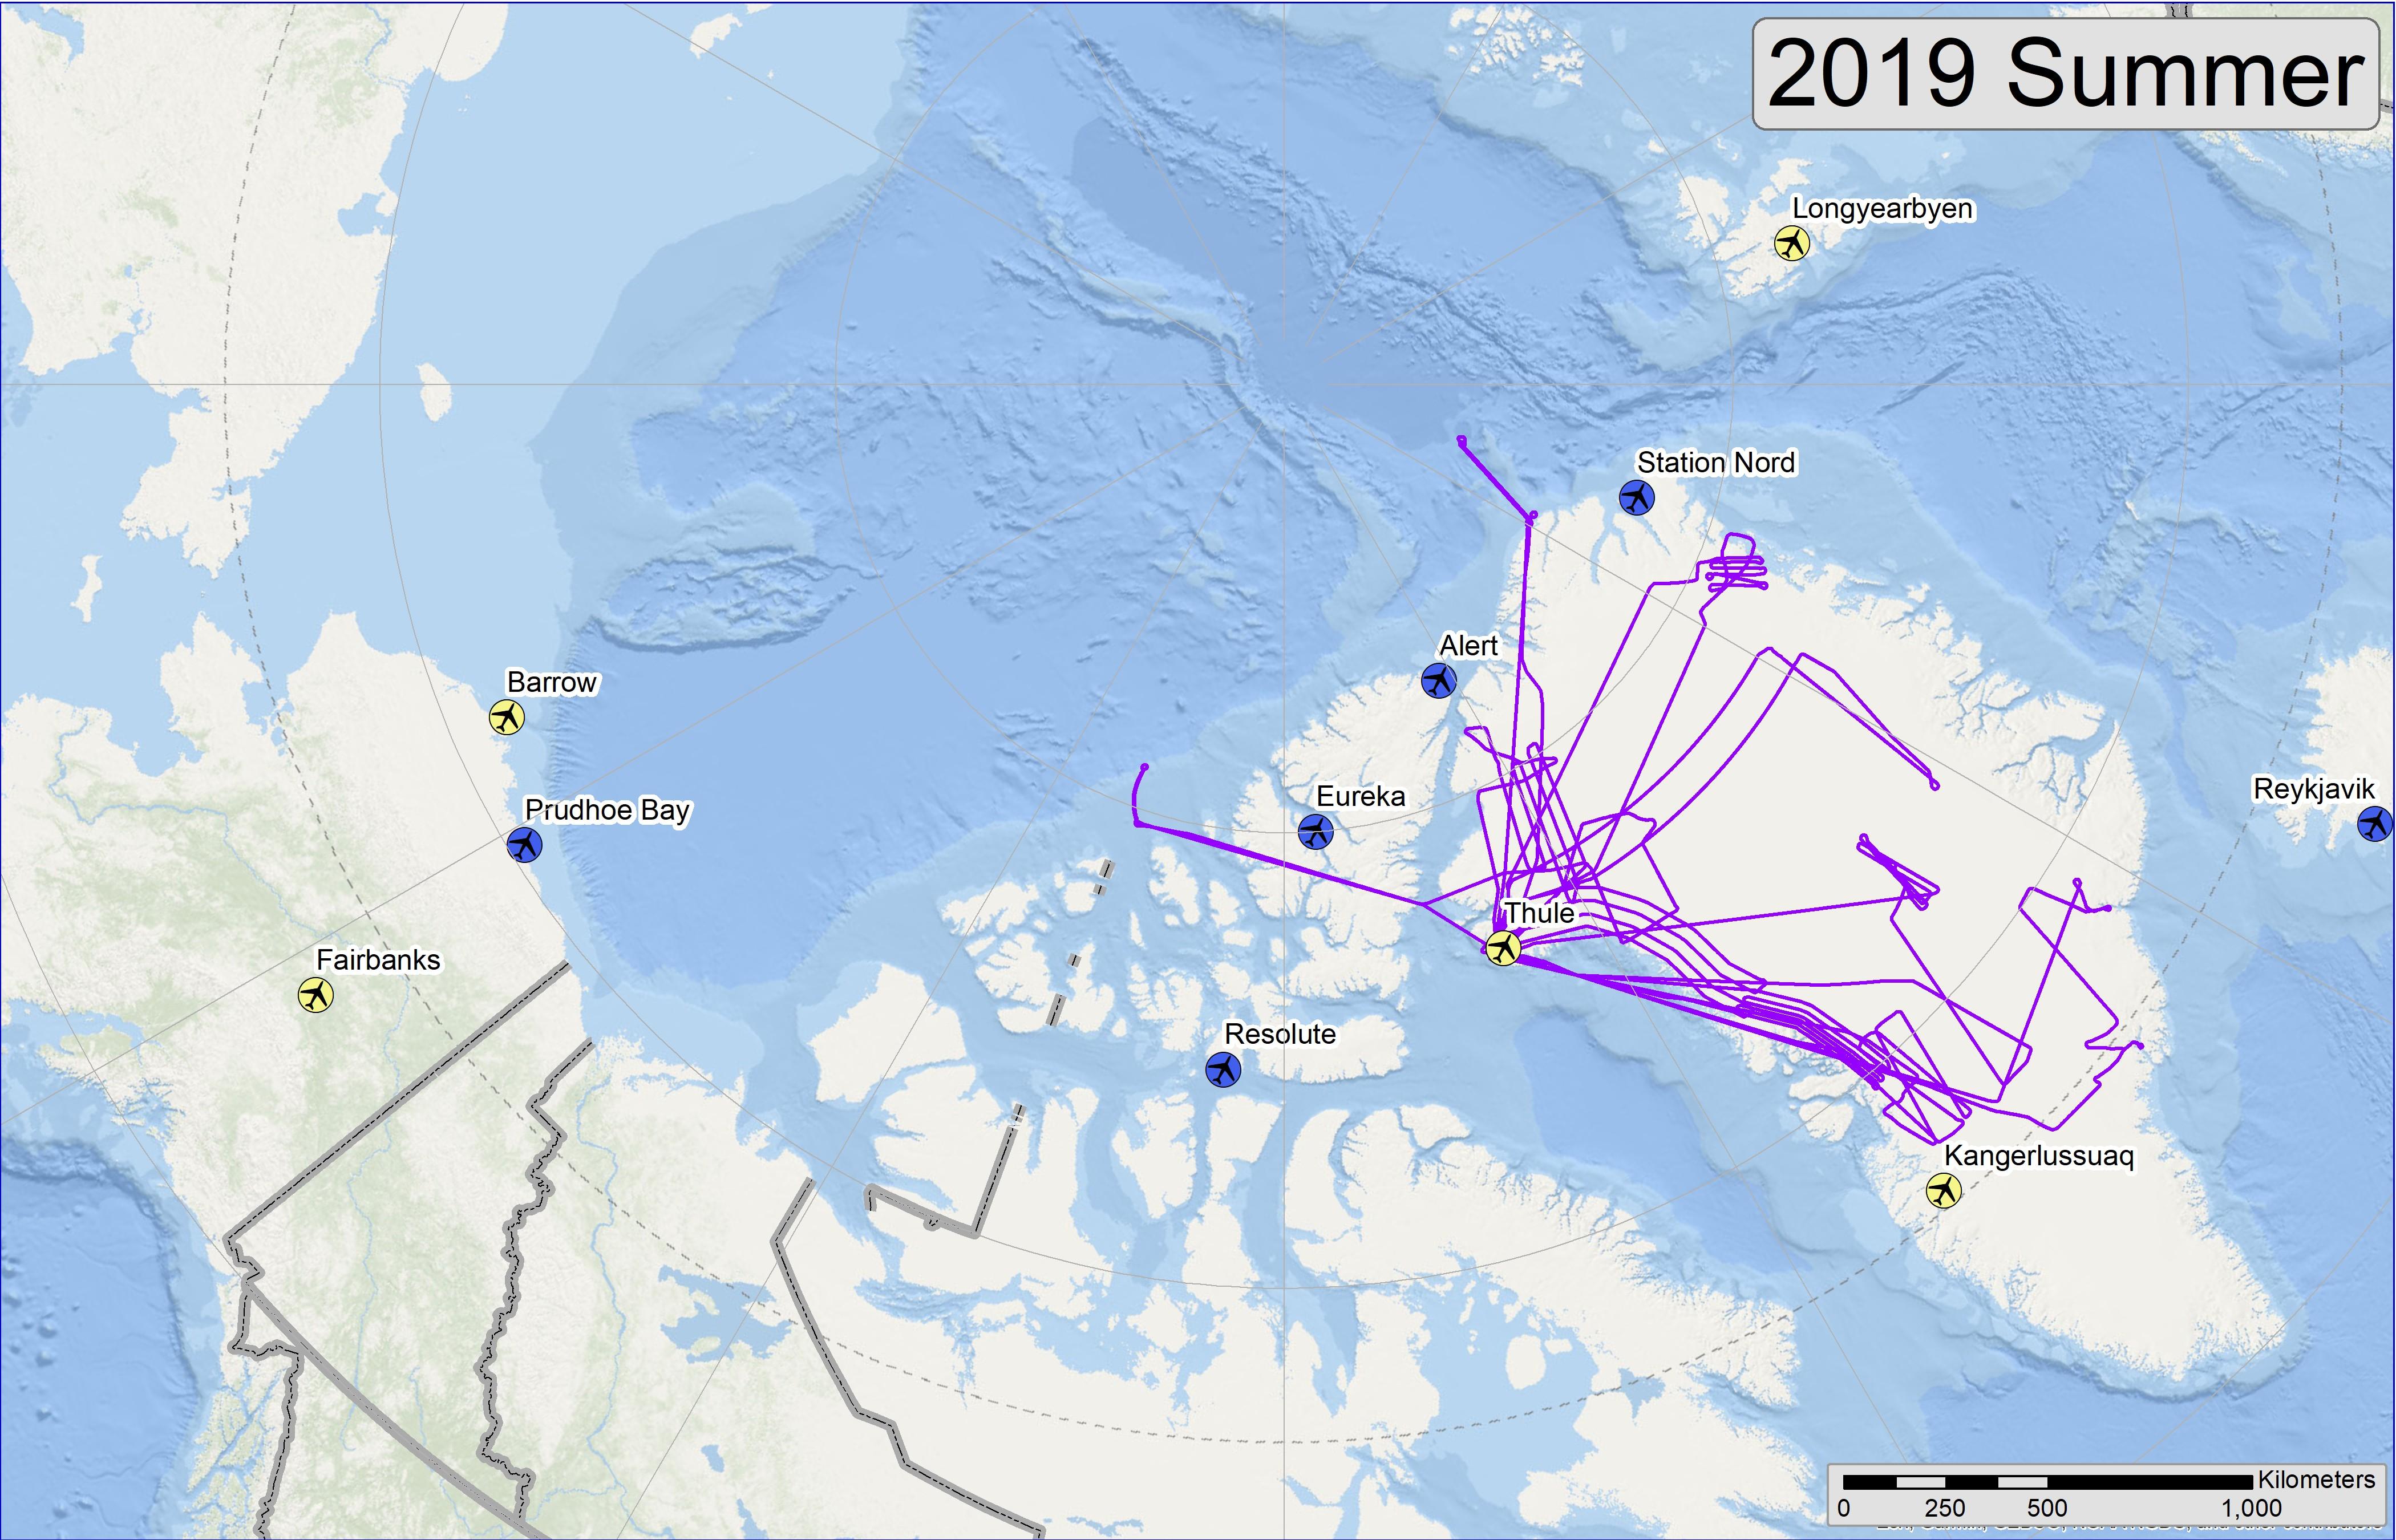 Map of 2019 Arctic Summer flight lines